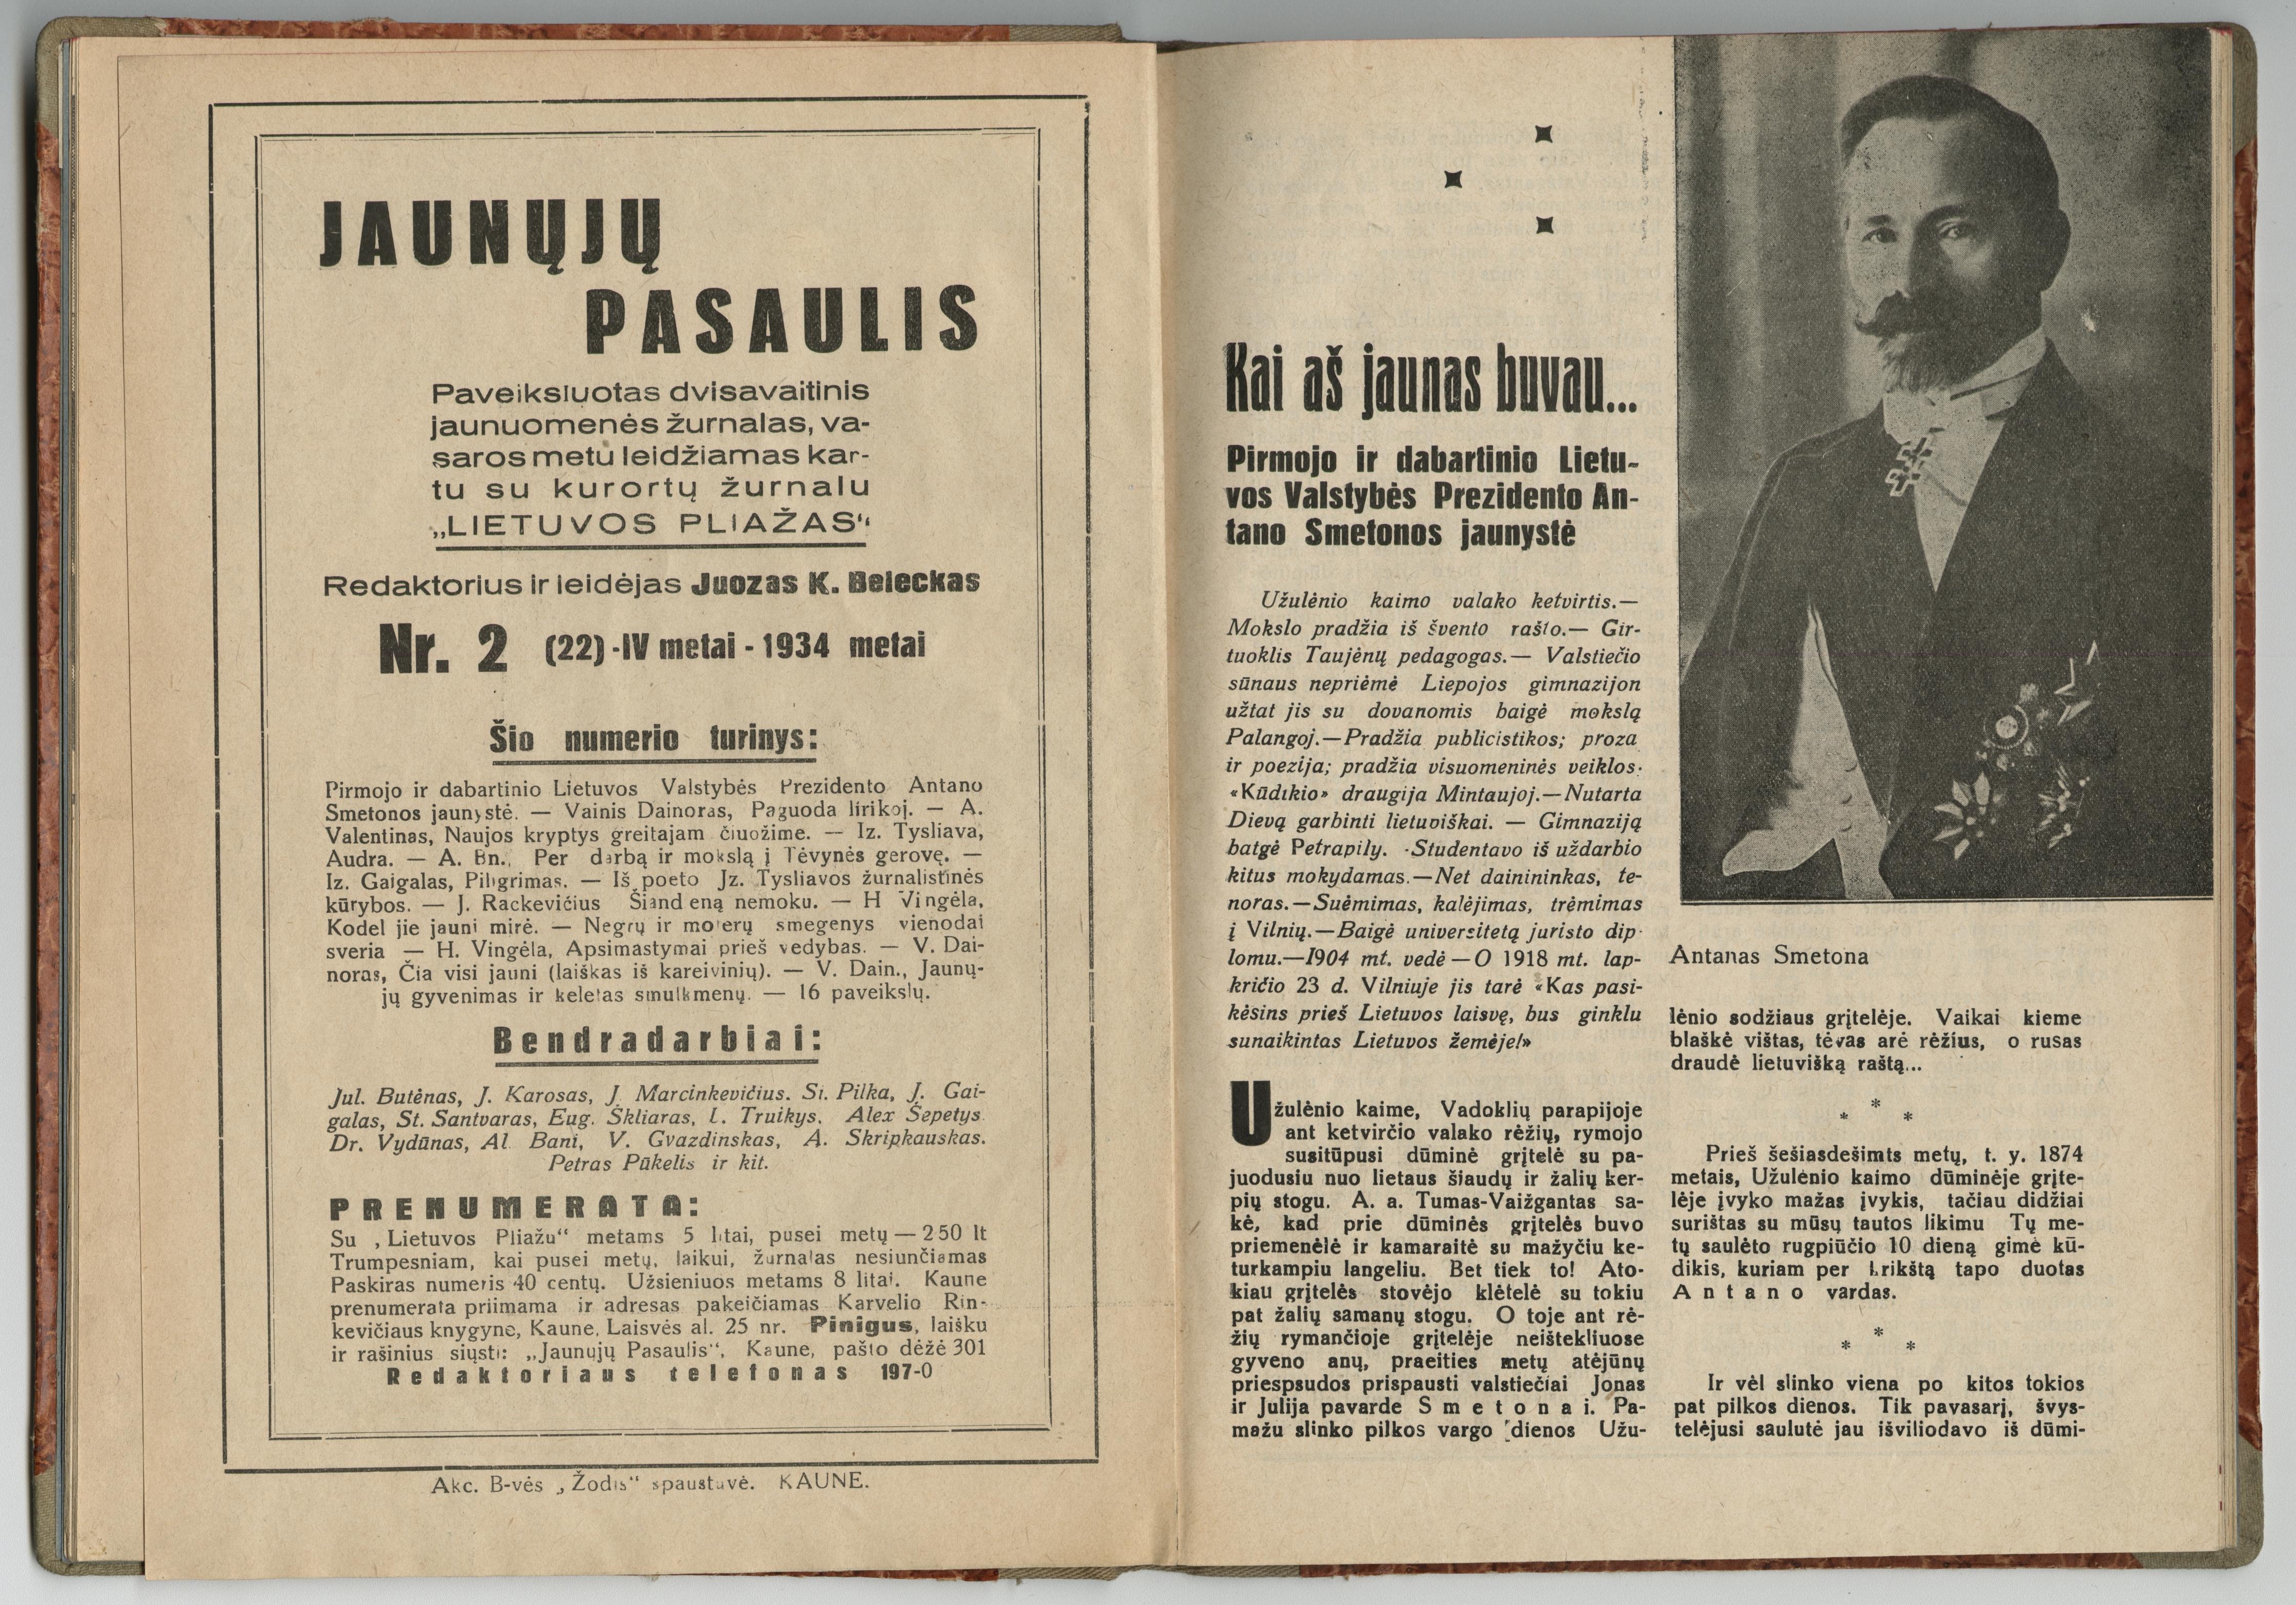 p. 86-2